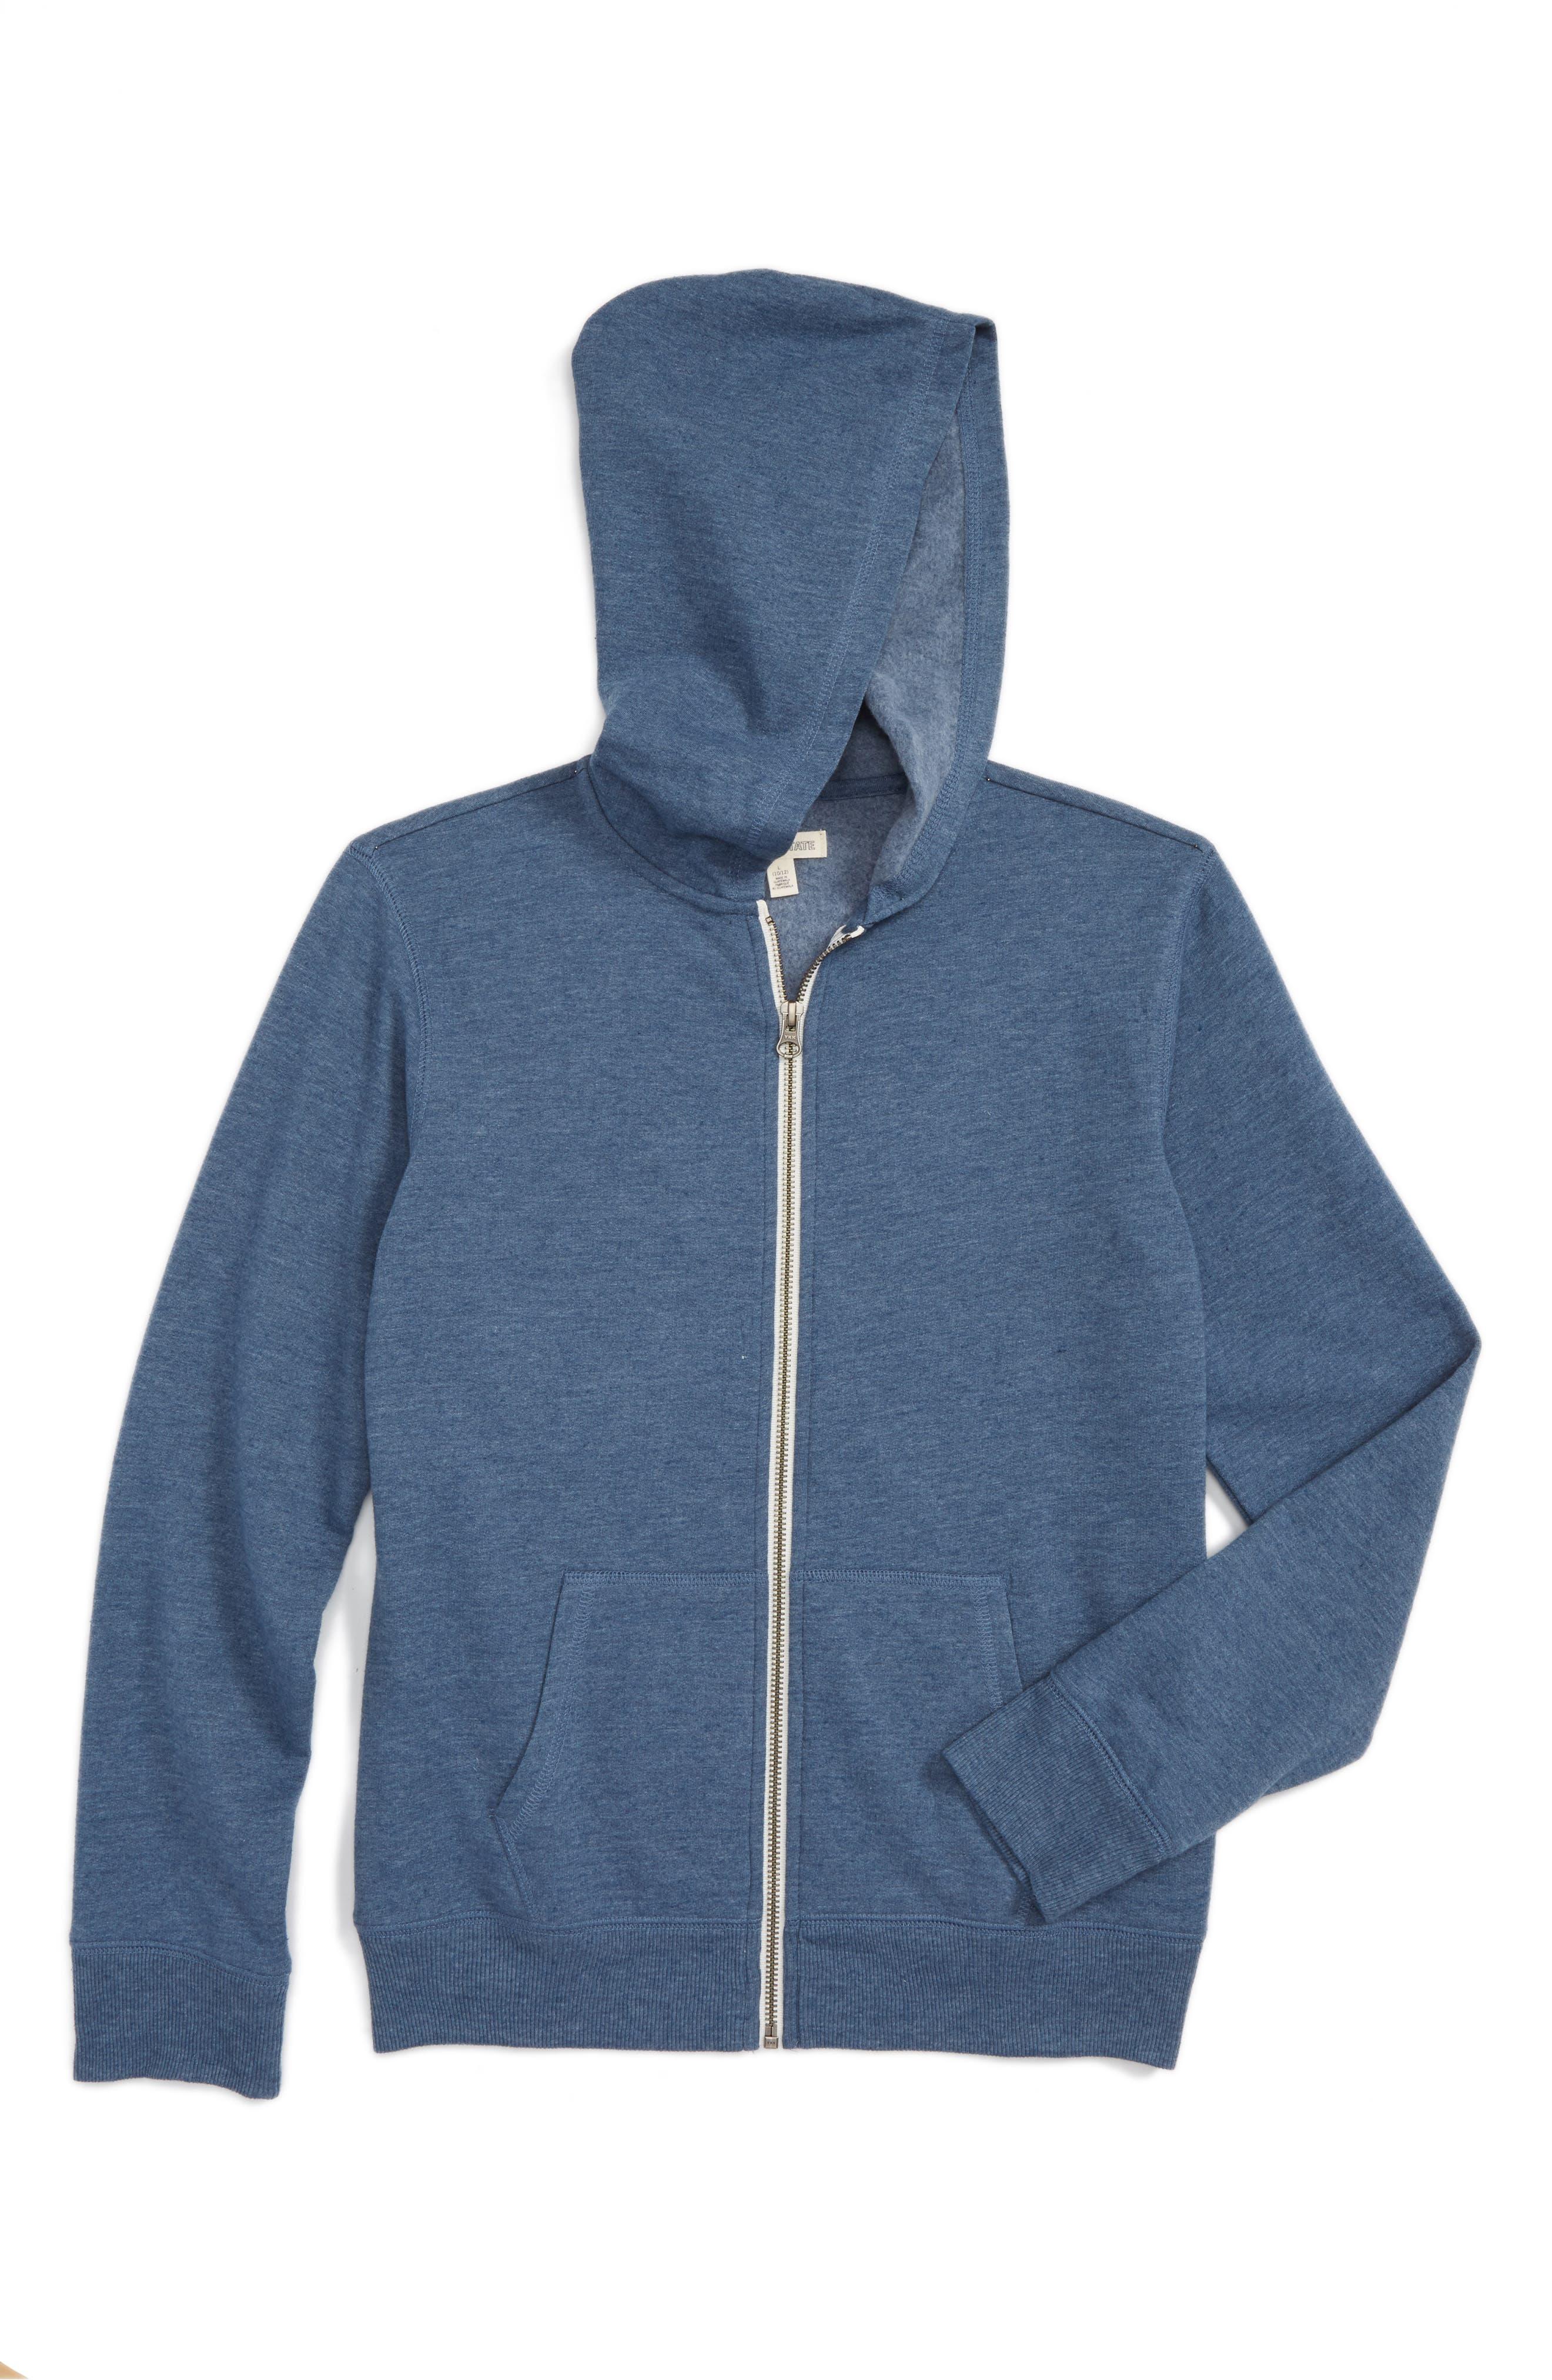 Alternate Image 1 Selected - Tucker + Tate Zip-Up Hooded Sweatshirt (Toddler Boys, Little Boys & Big Boys)